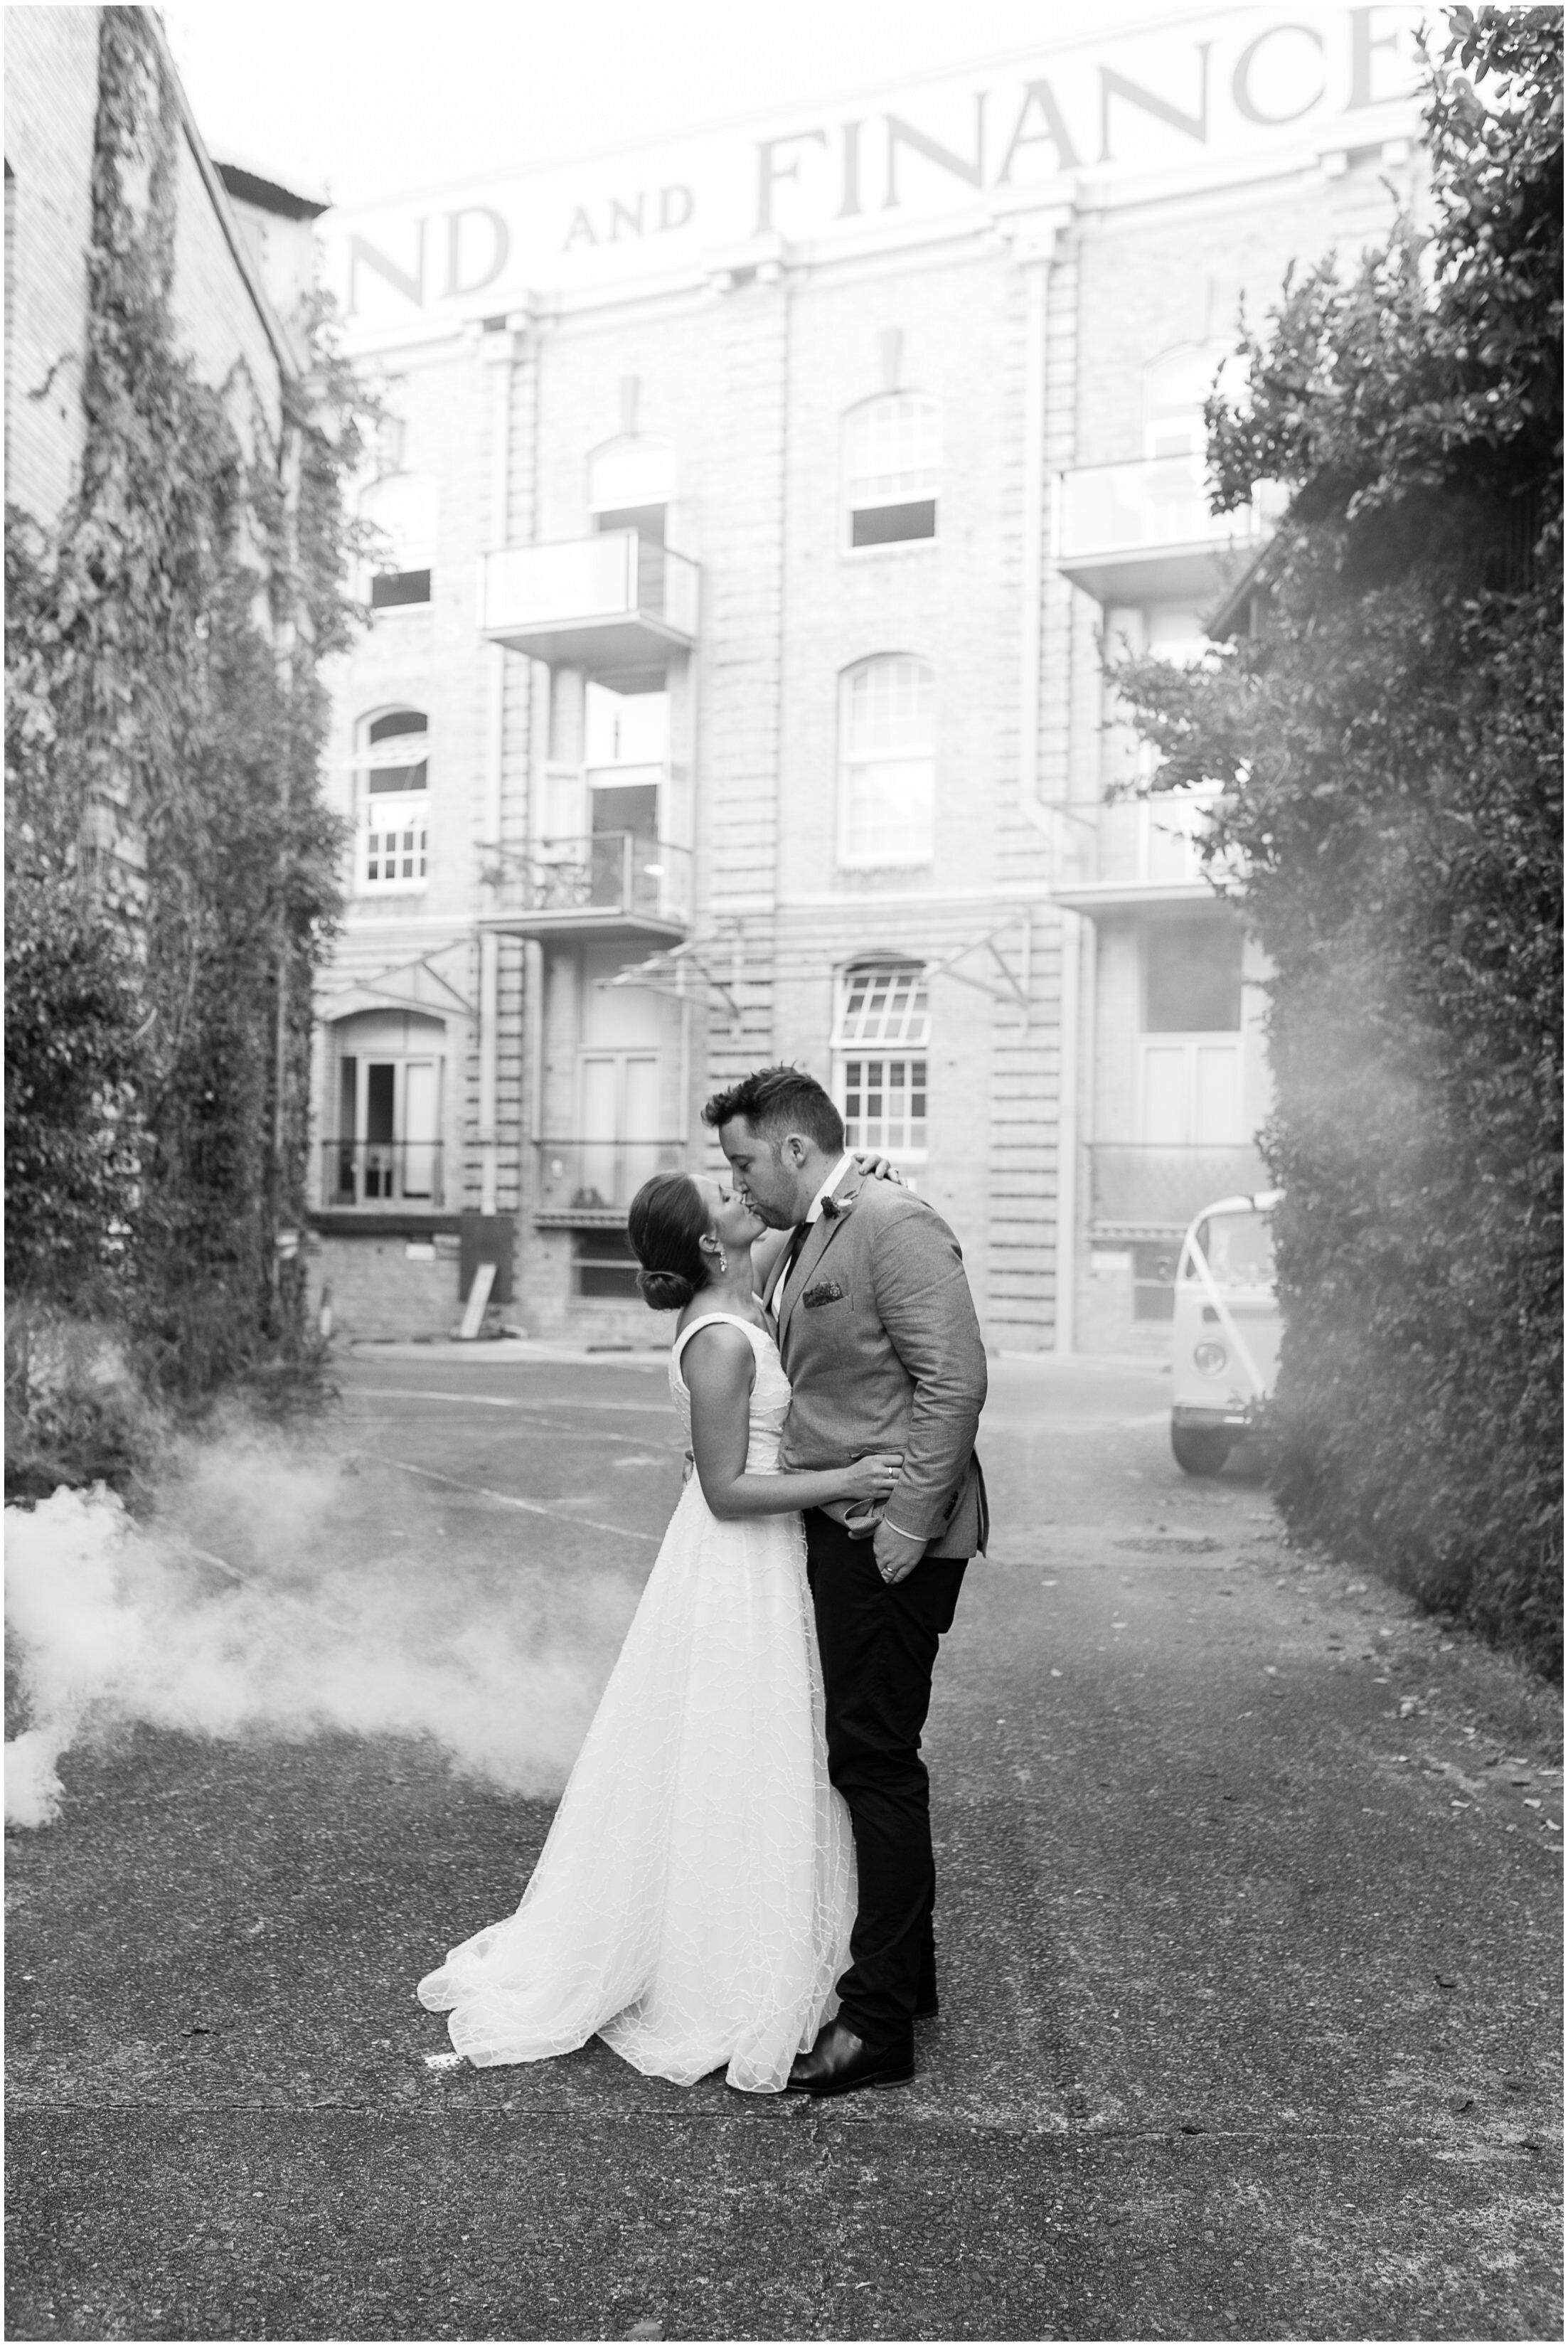 refinery-brisbane-wedding-photography-film-photographer-fine-art-47.jpg